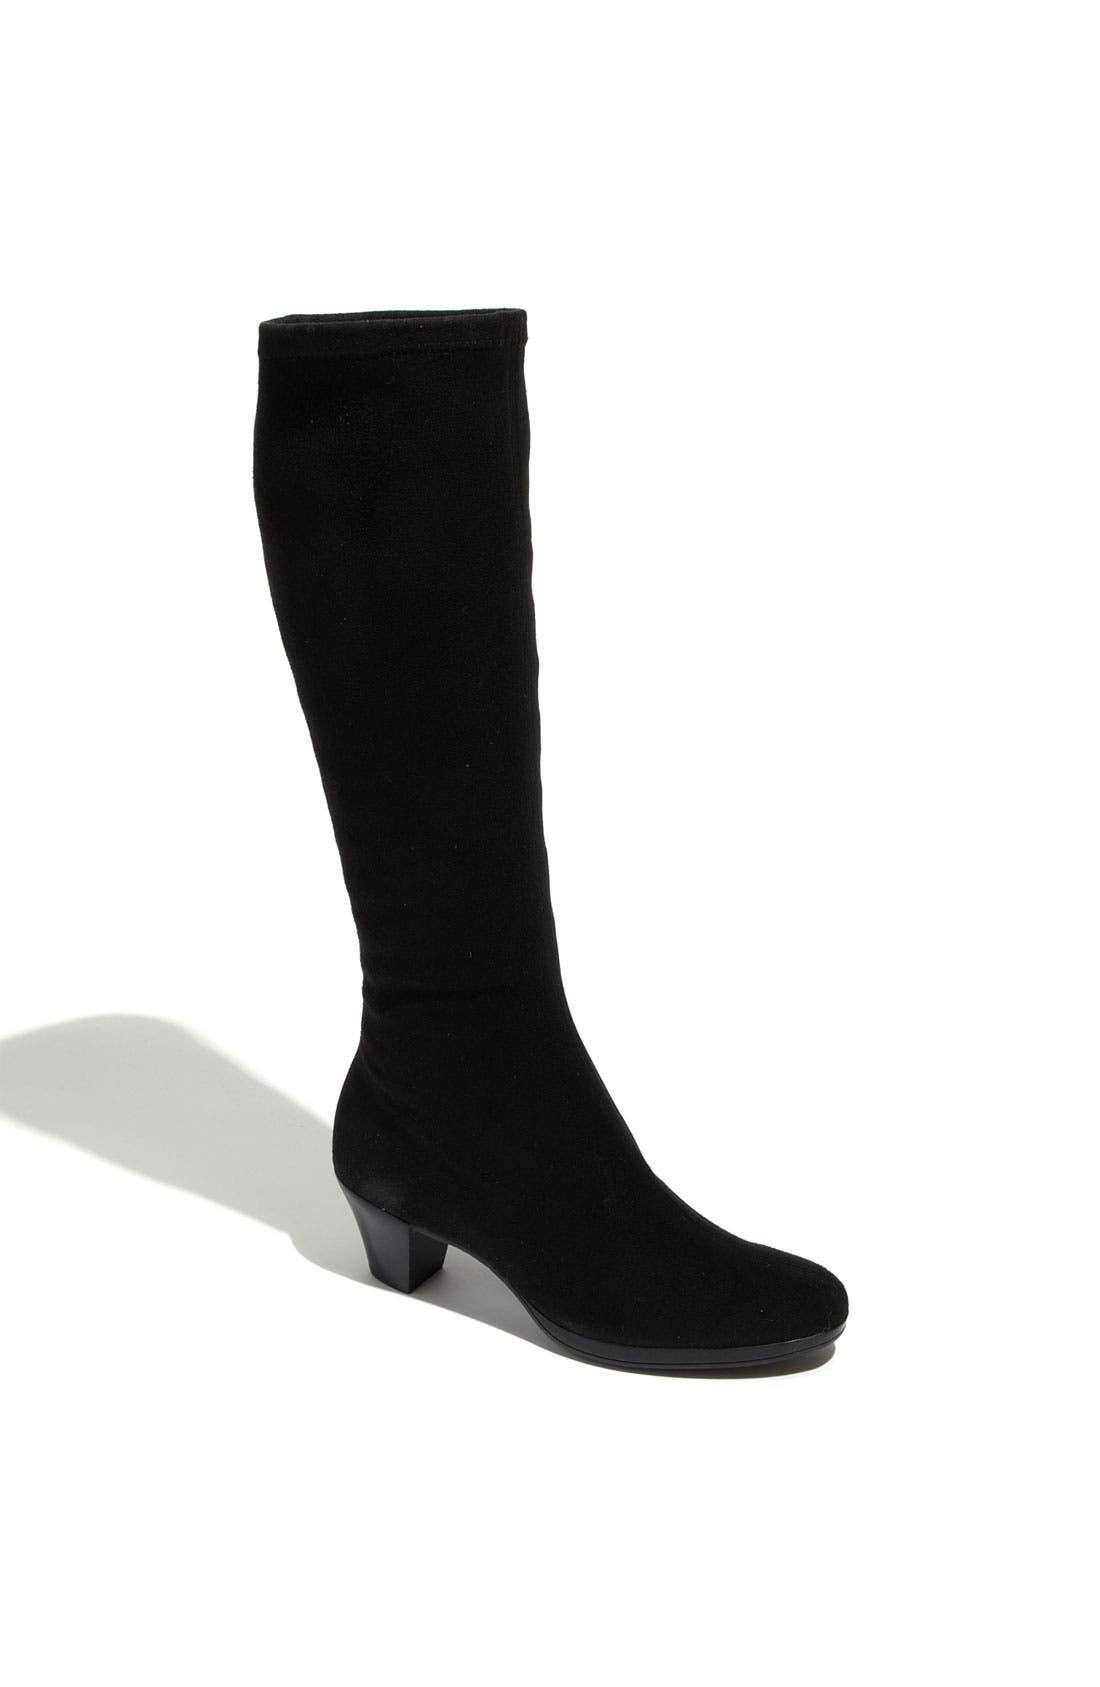 Alternate Image 1 Selected - Munro 'Sophia' Stretch Boot